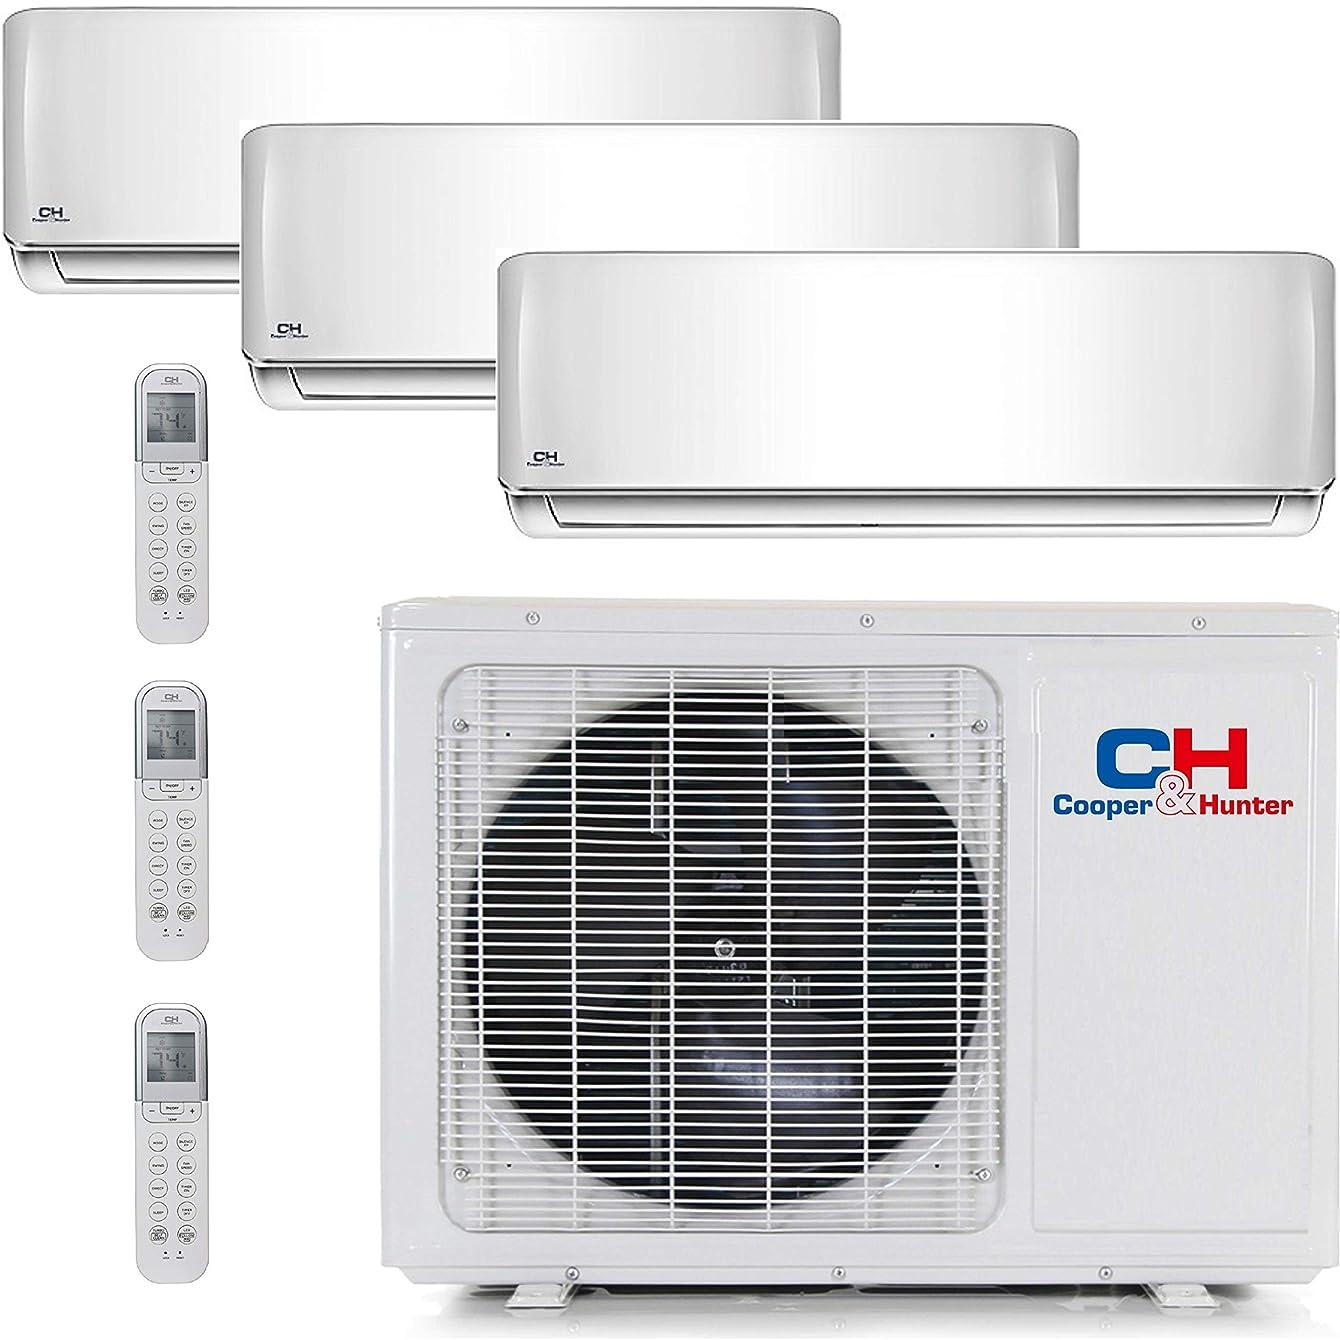 COOPER AND HUNTER Tri 3 Zone Mini Split Ductless Air Conditioner Heat Pump 9000 12000 12000 Multi